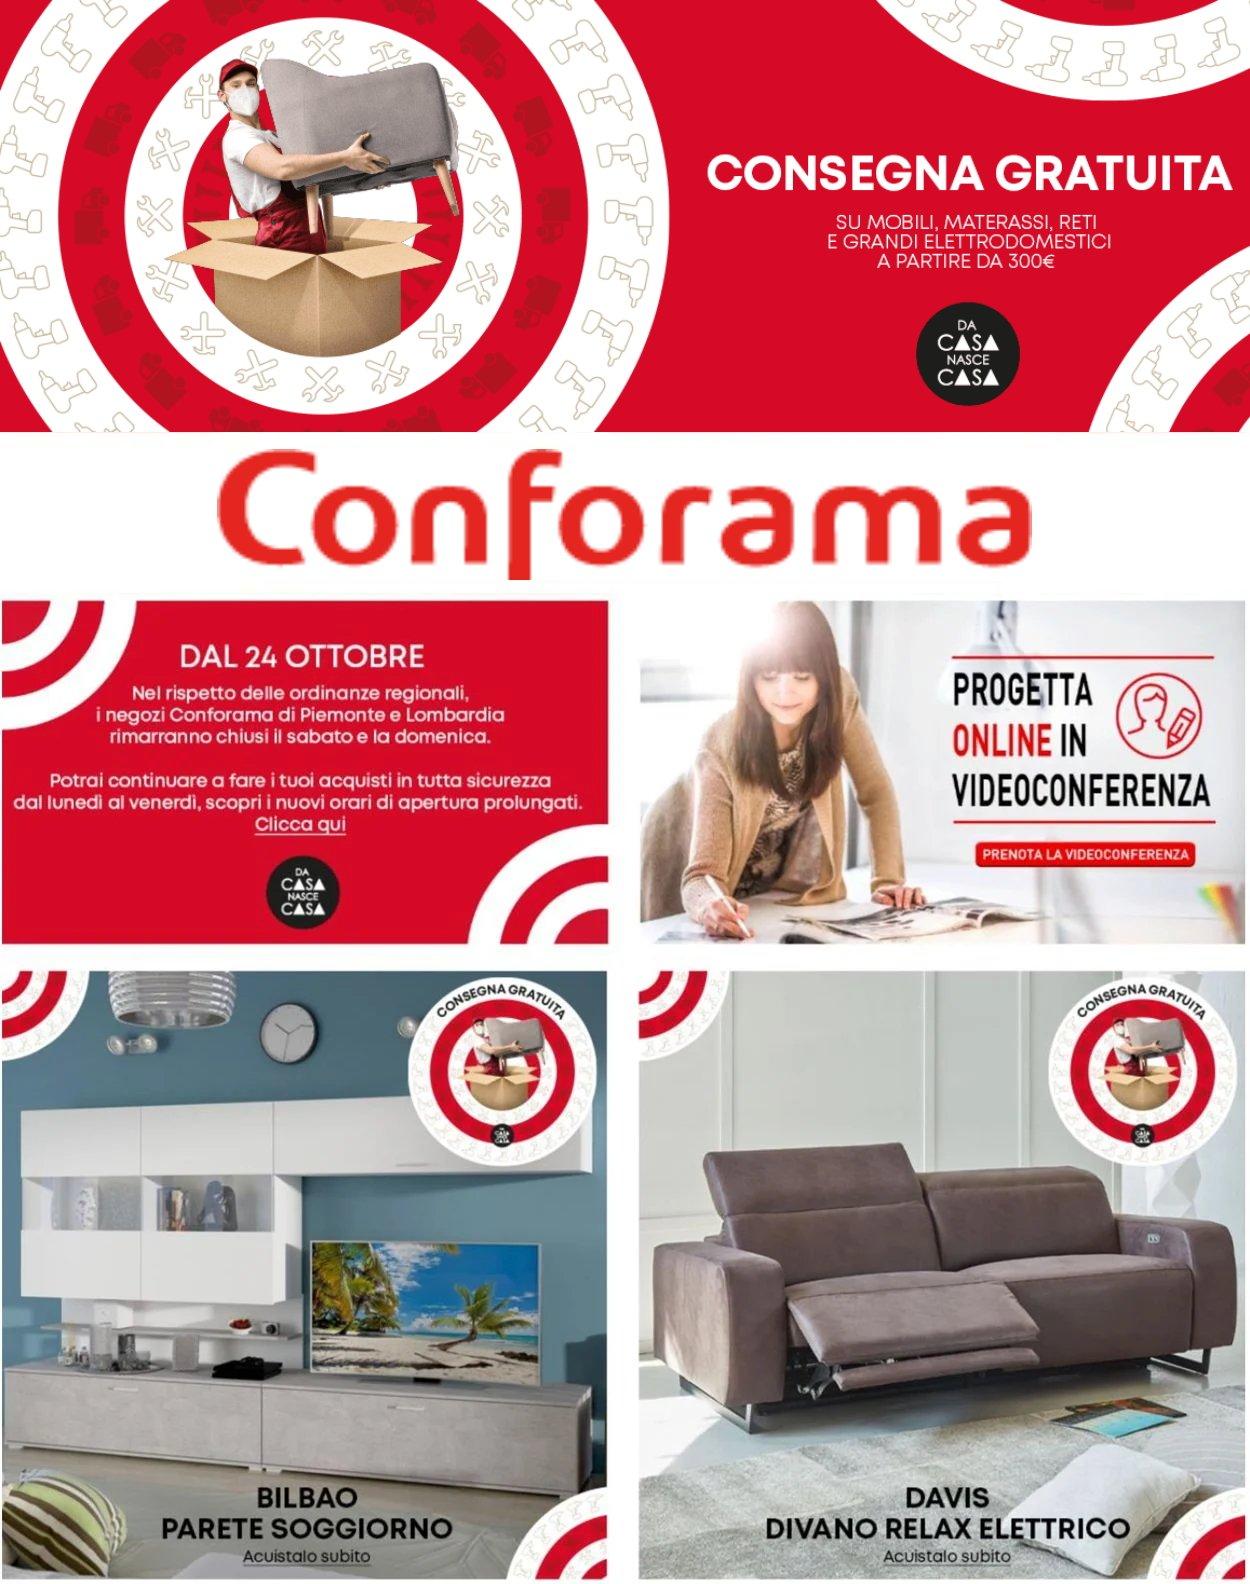 Volantino Conforama - Offerte 09/11-17/11/2020